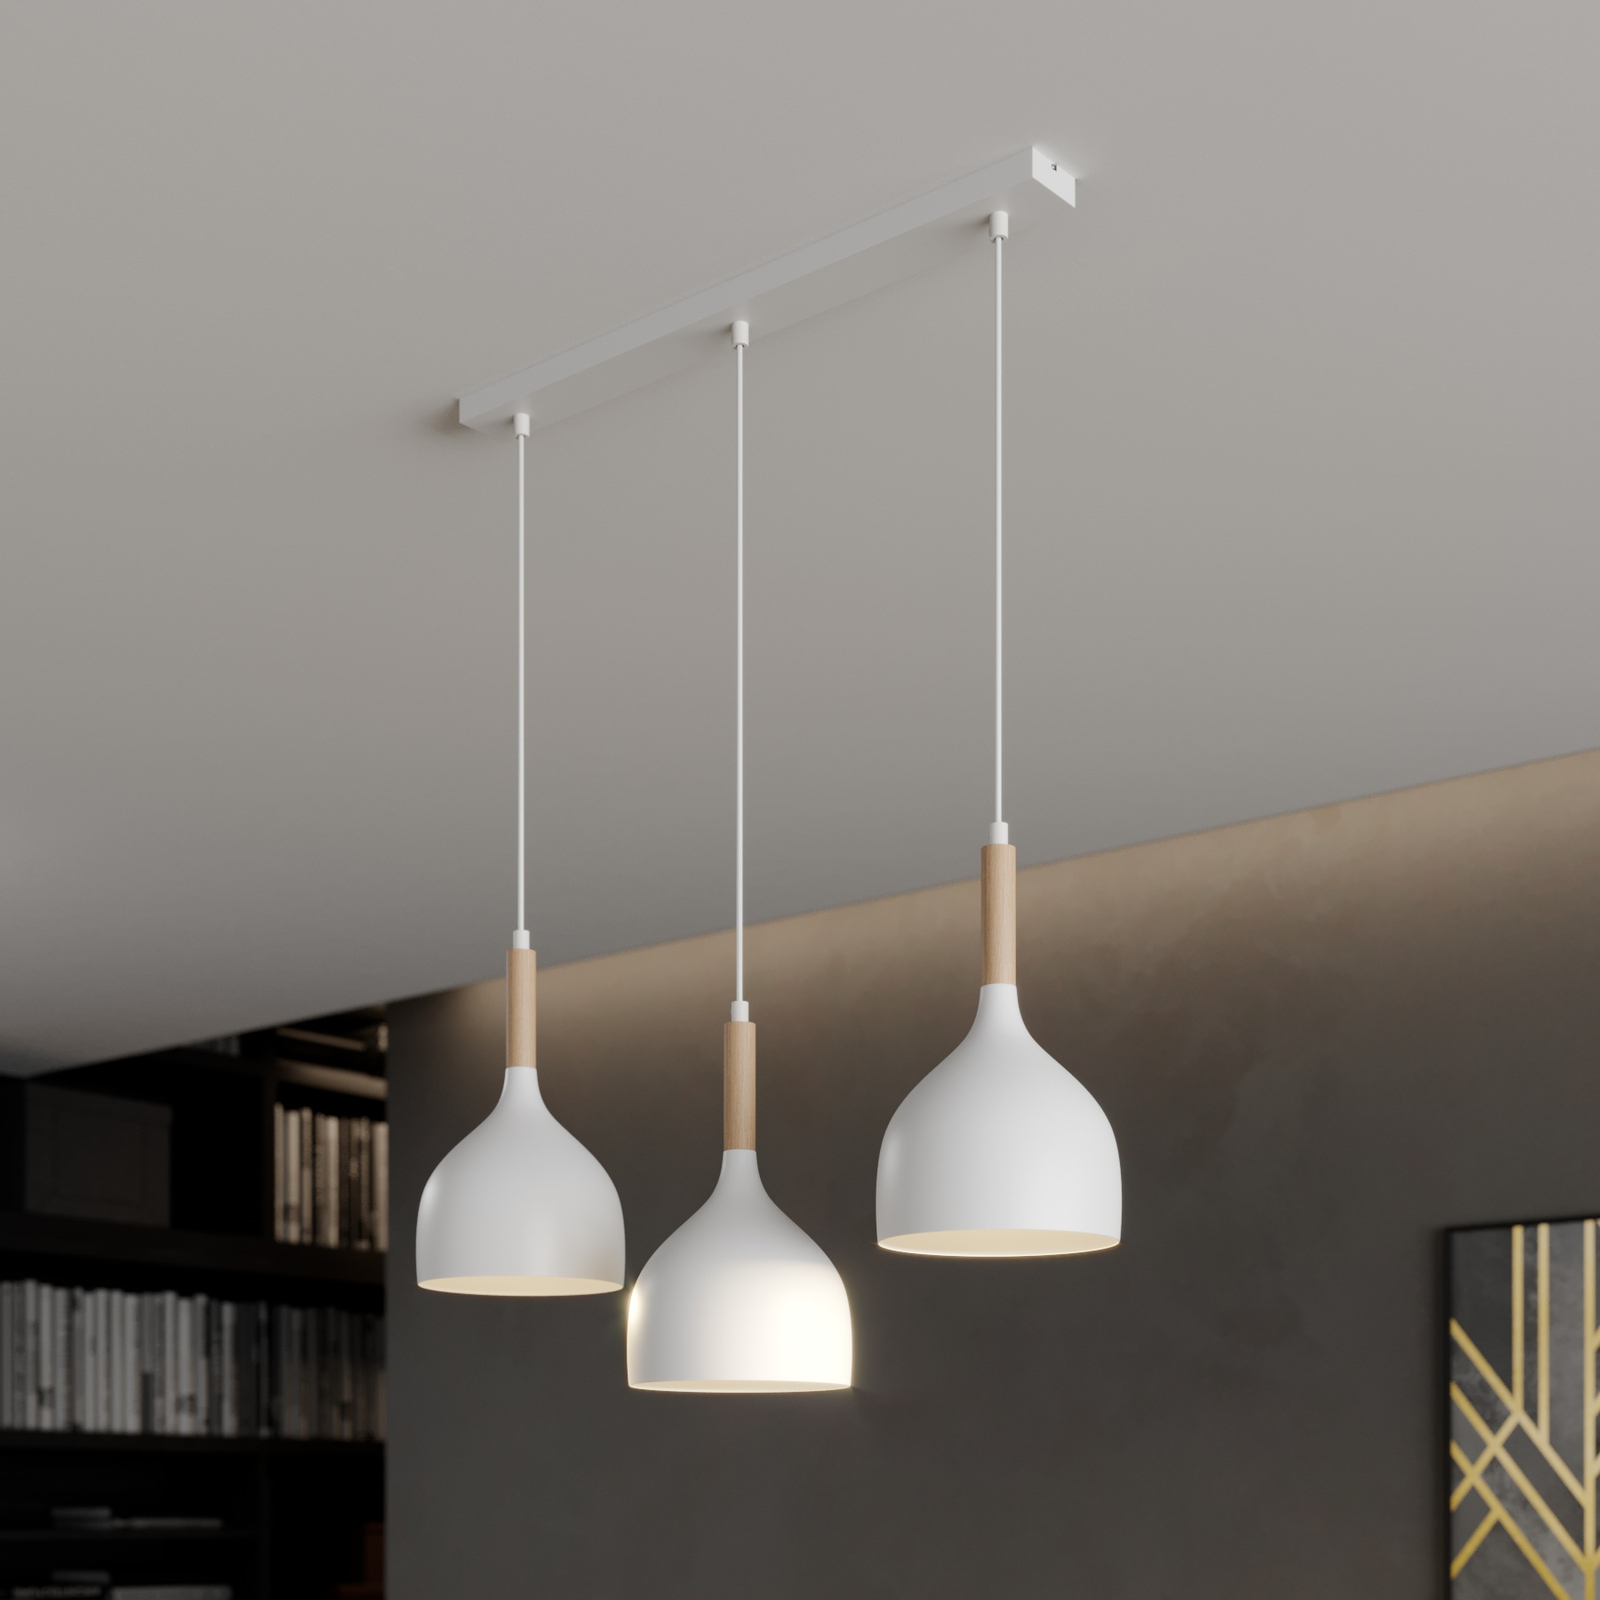 Hanglamp Noak 3-lamps lineair wit/hout natuur